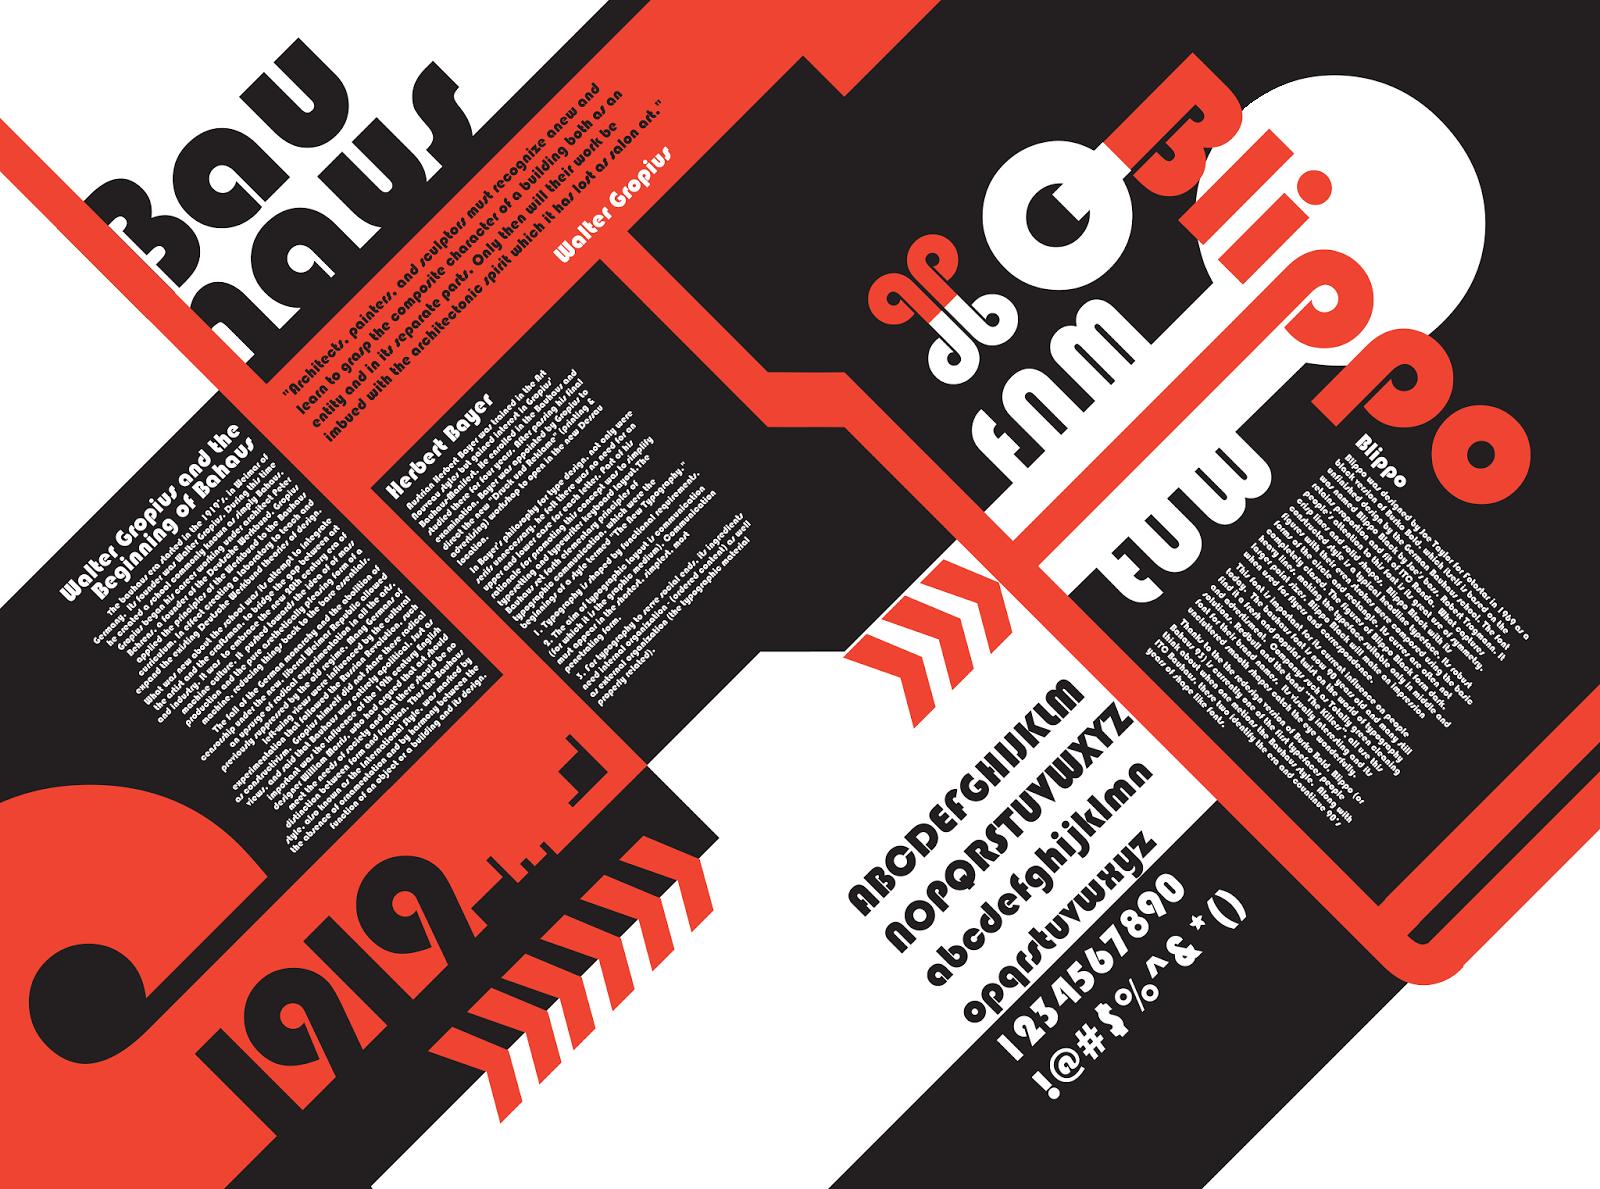 tipografa sans serif desde en la bauhaus